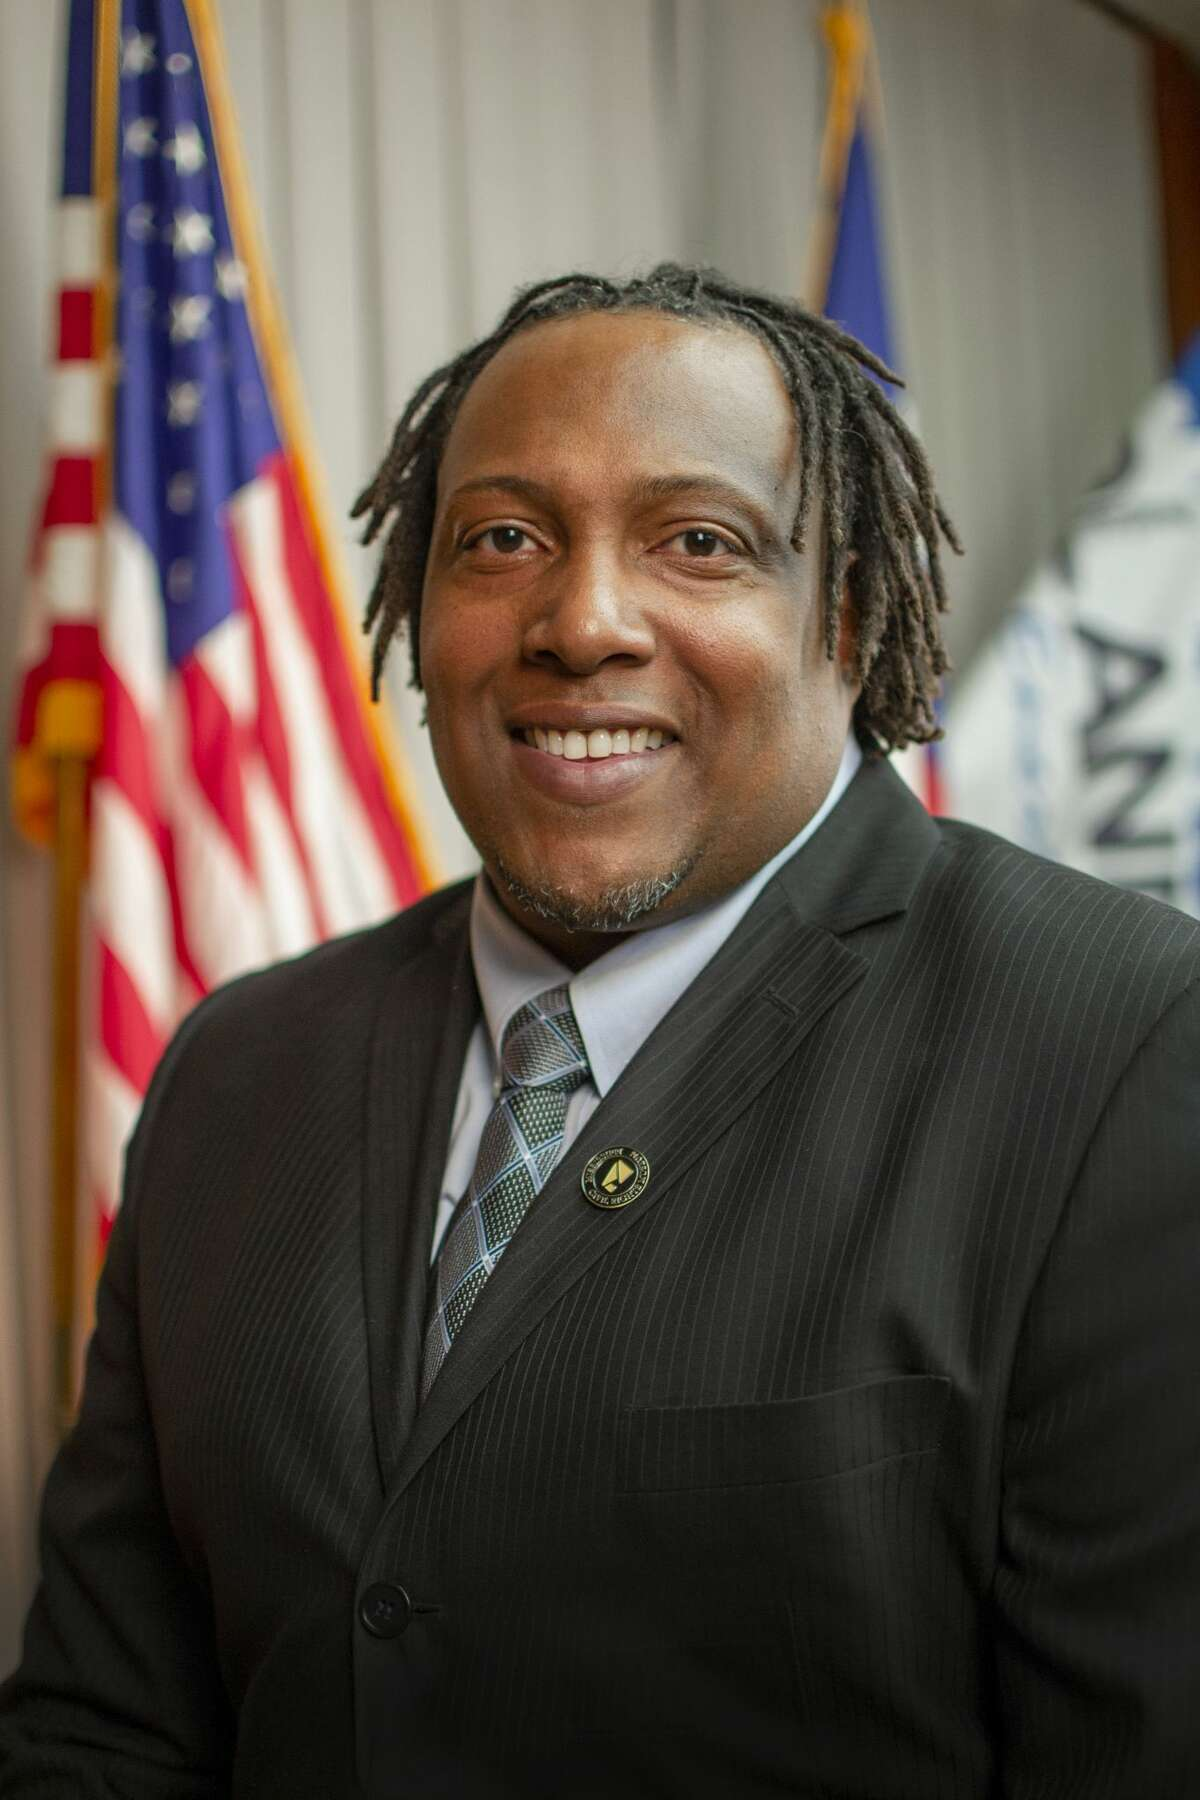 District 2 Councilman John Norman